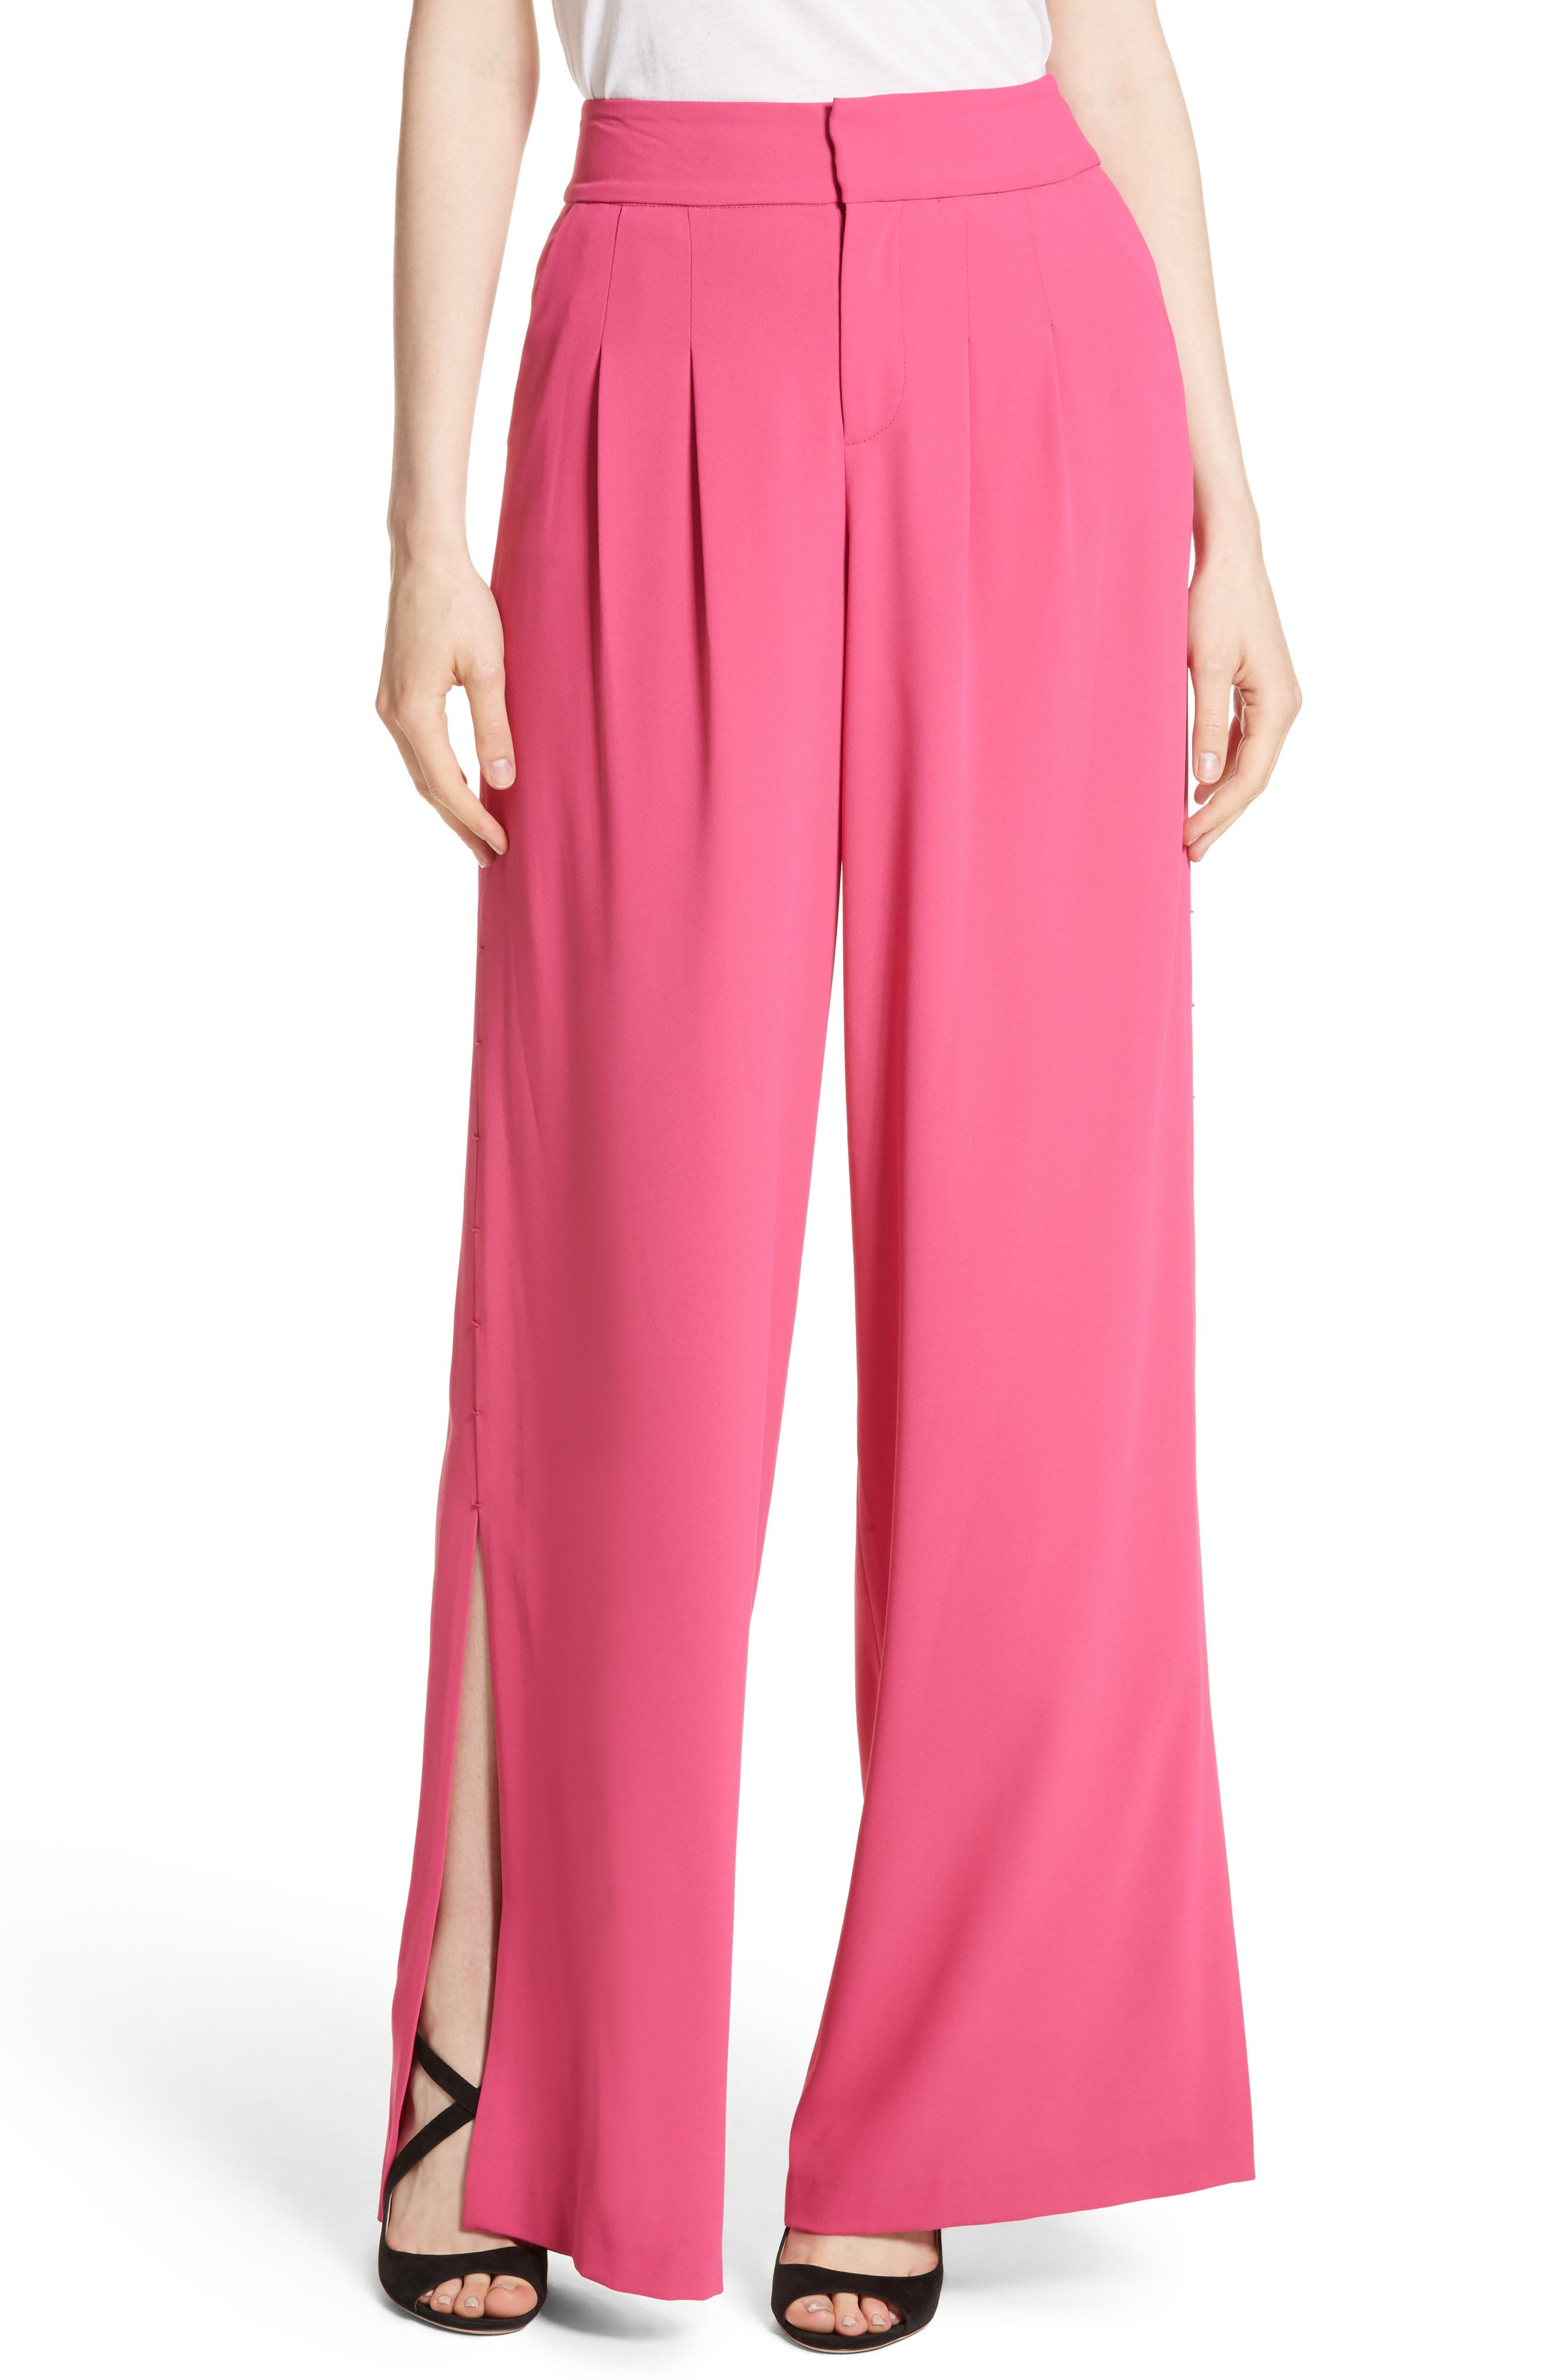 Shavon High Waist Side Slit Flare Pants,                             Main thumbnail 1, color,                             Fuchsia